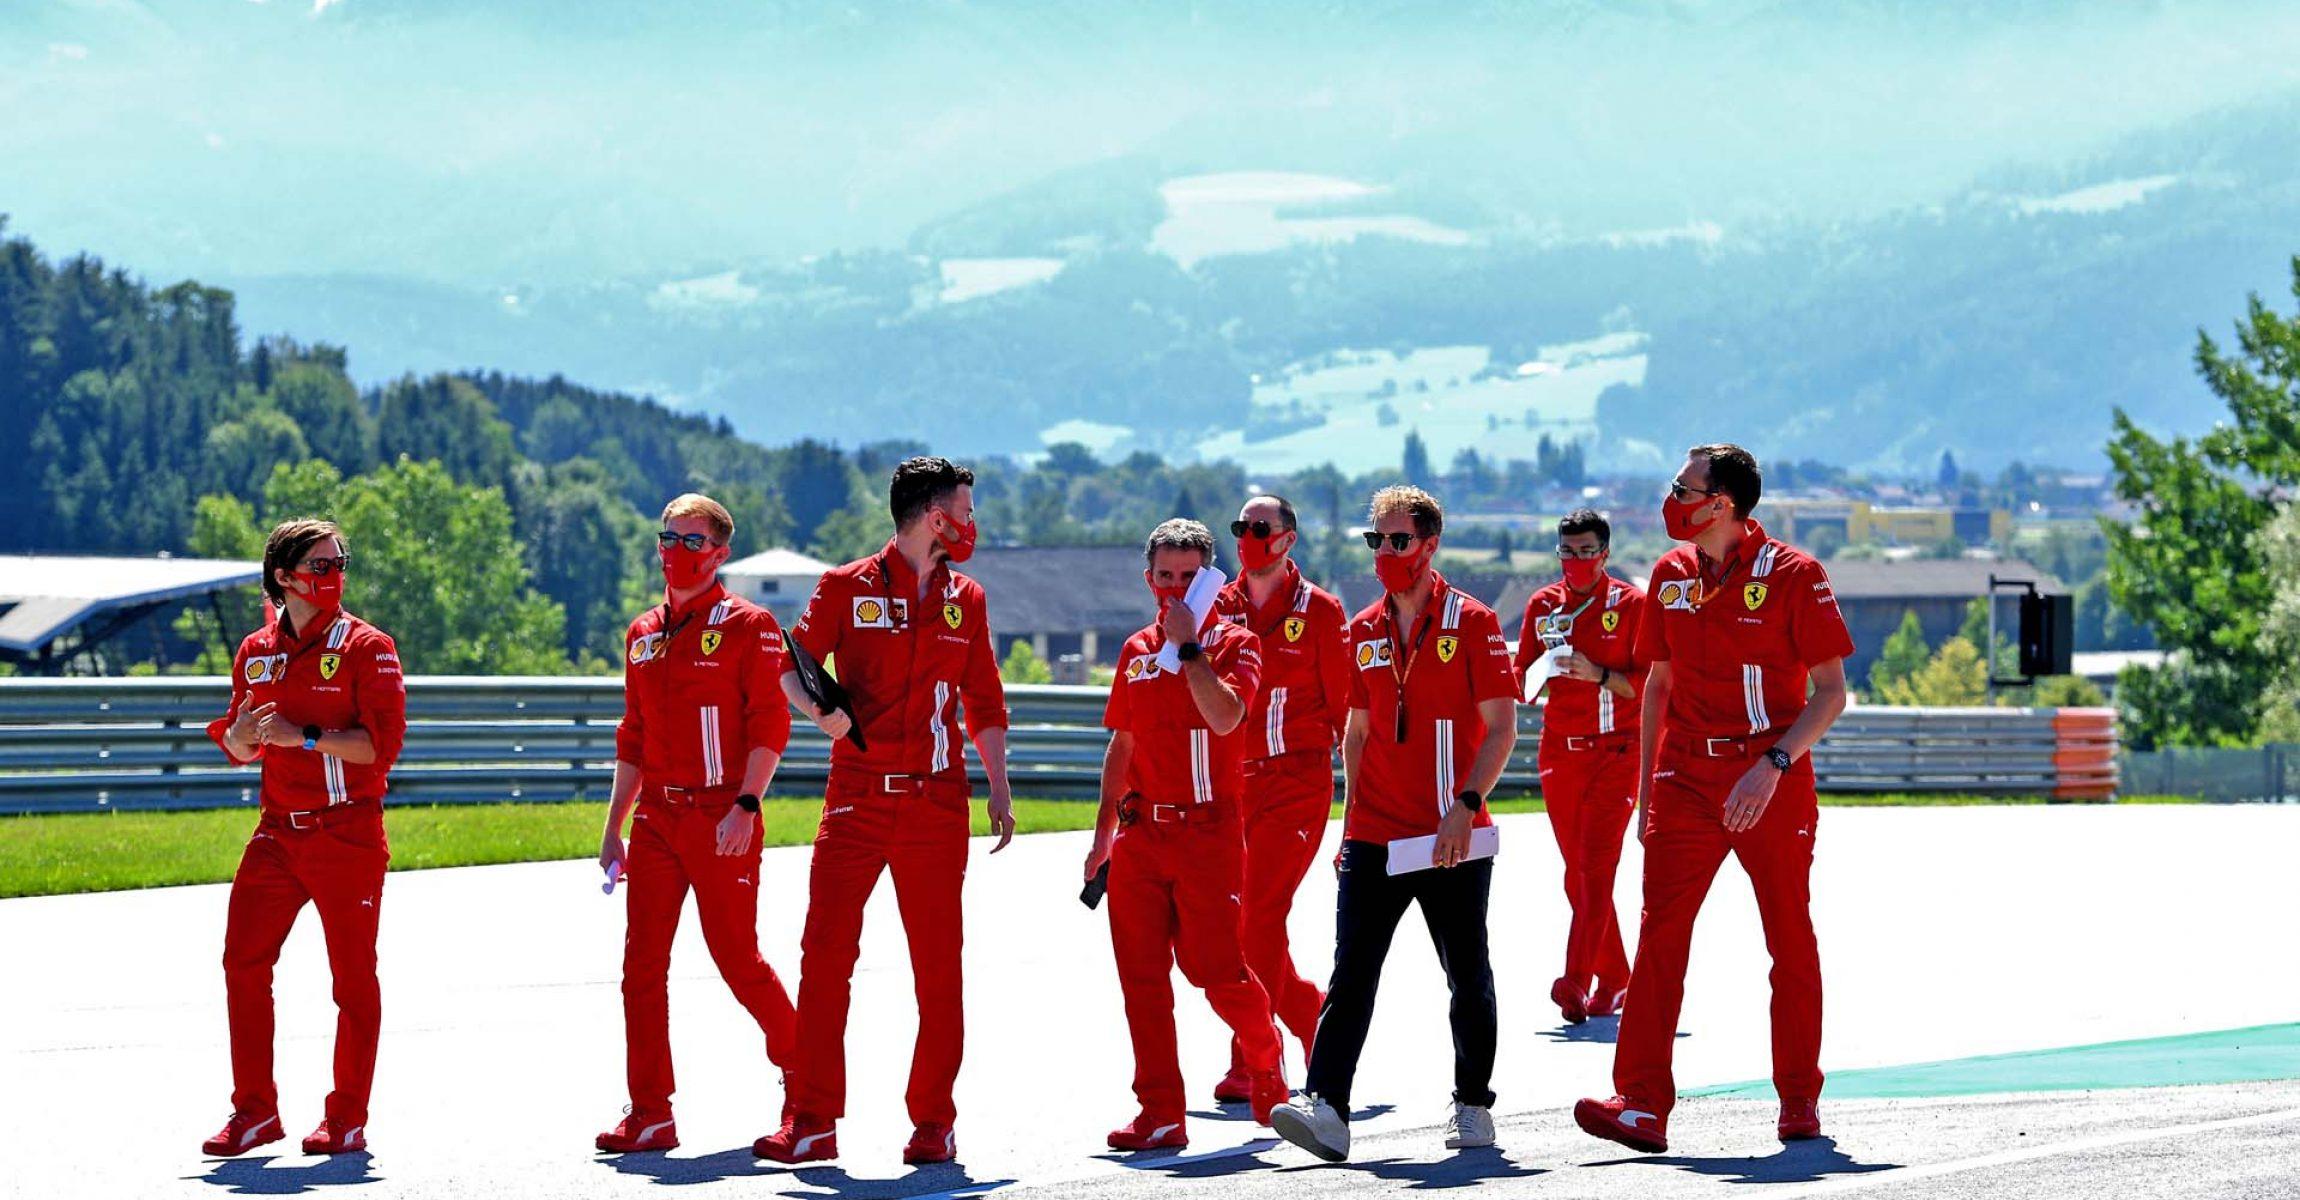 GP AUSTRIA F1/2020 - GIOVEDÌ 02/07/2020 credit: @Scuderia Ferrari Press Office track walk Sebastian Vettel